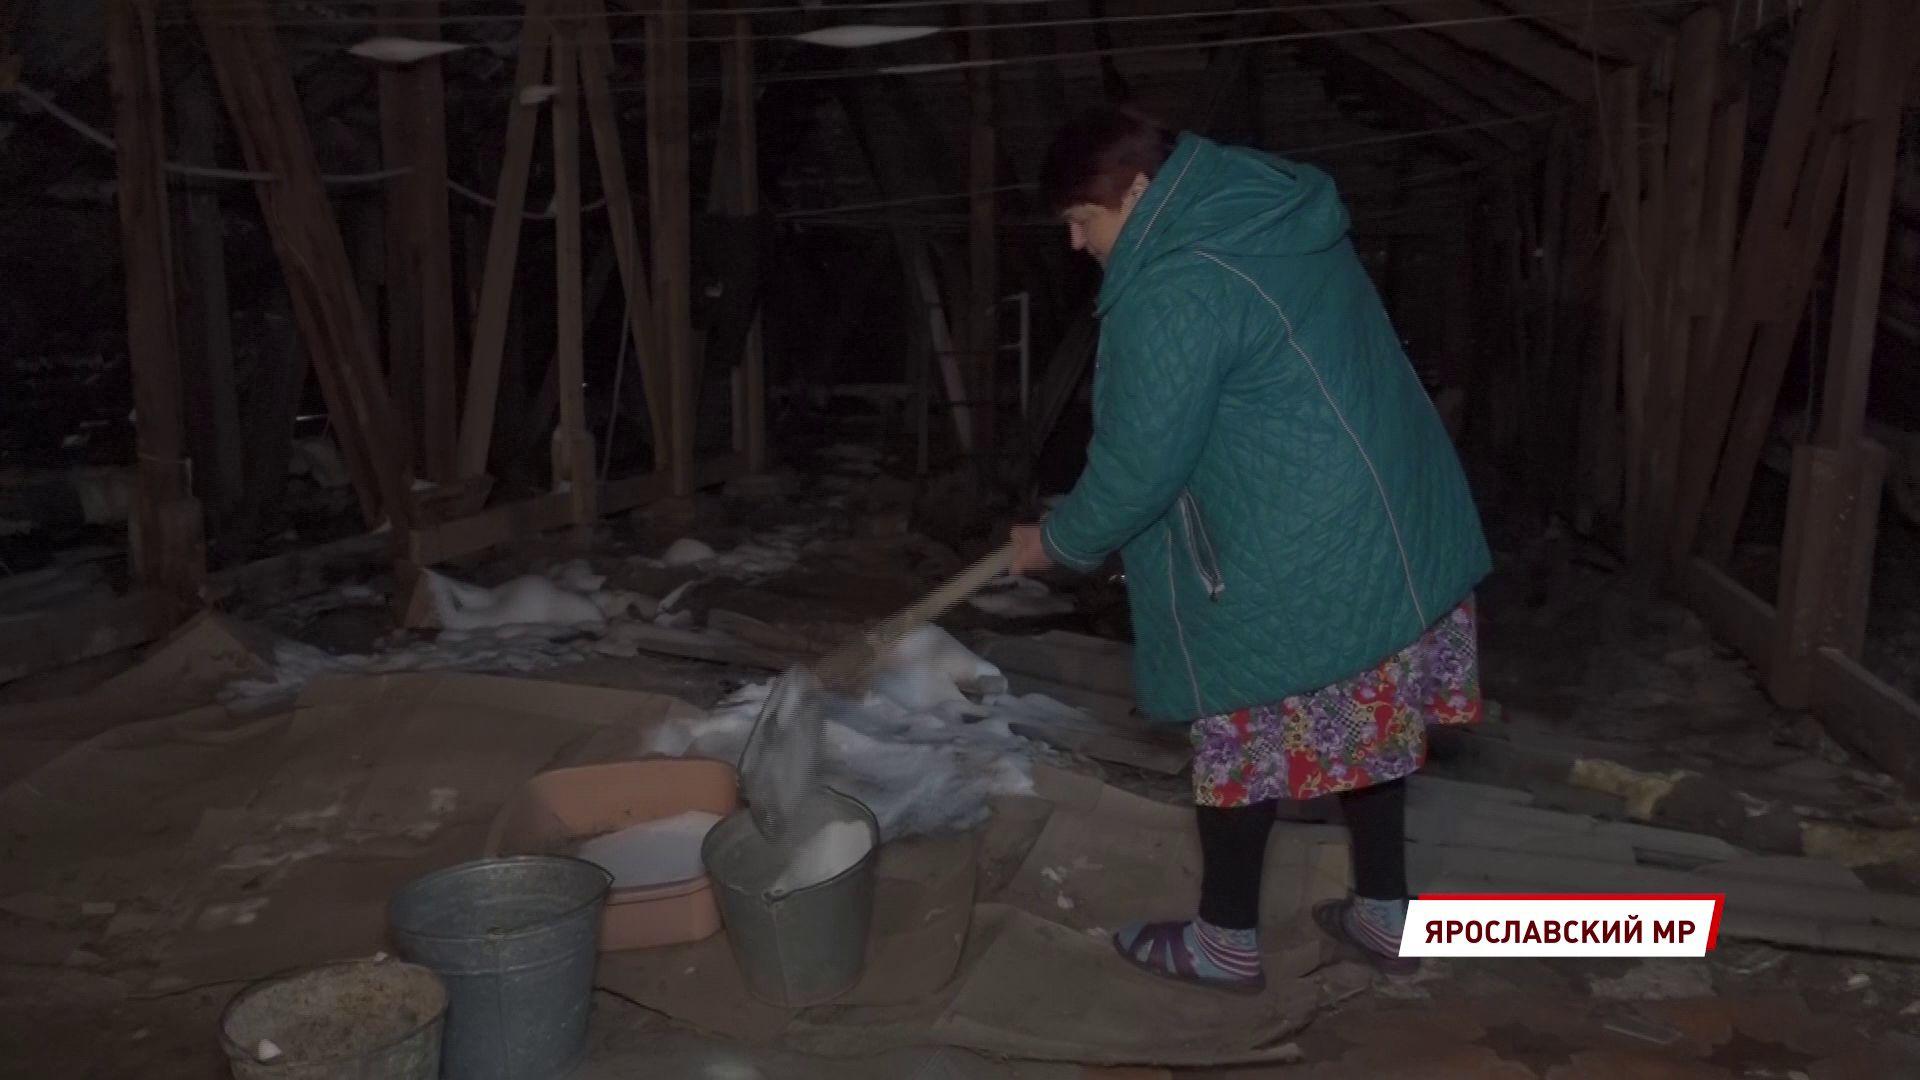 Жители многоквартирного дома в поселке Дубки мешками и ведрами выносят снег с чердака